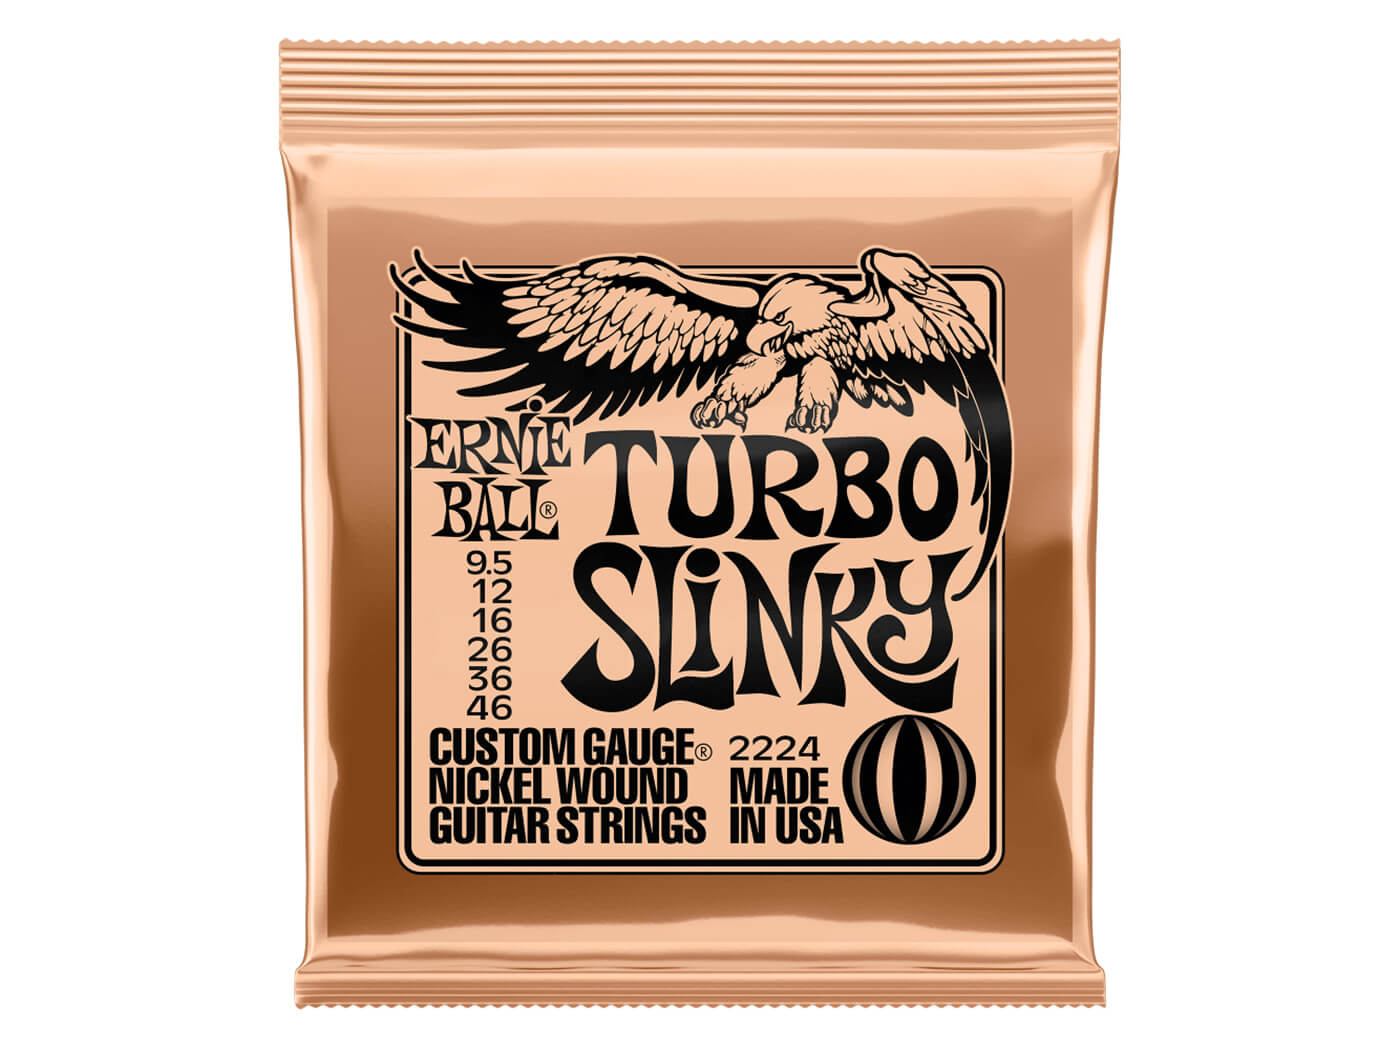 Ernie Ball Turbo Slinky Nickel Wound Electric Guitar Strings